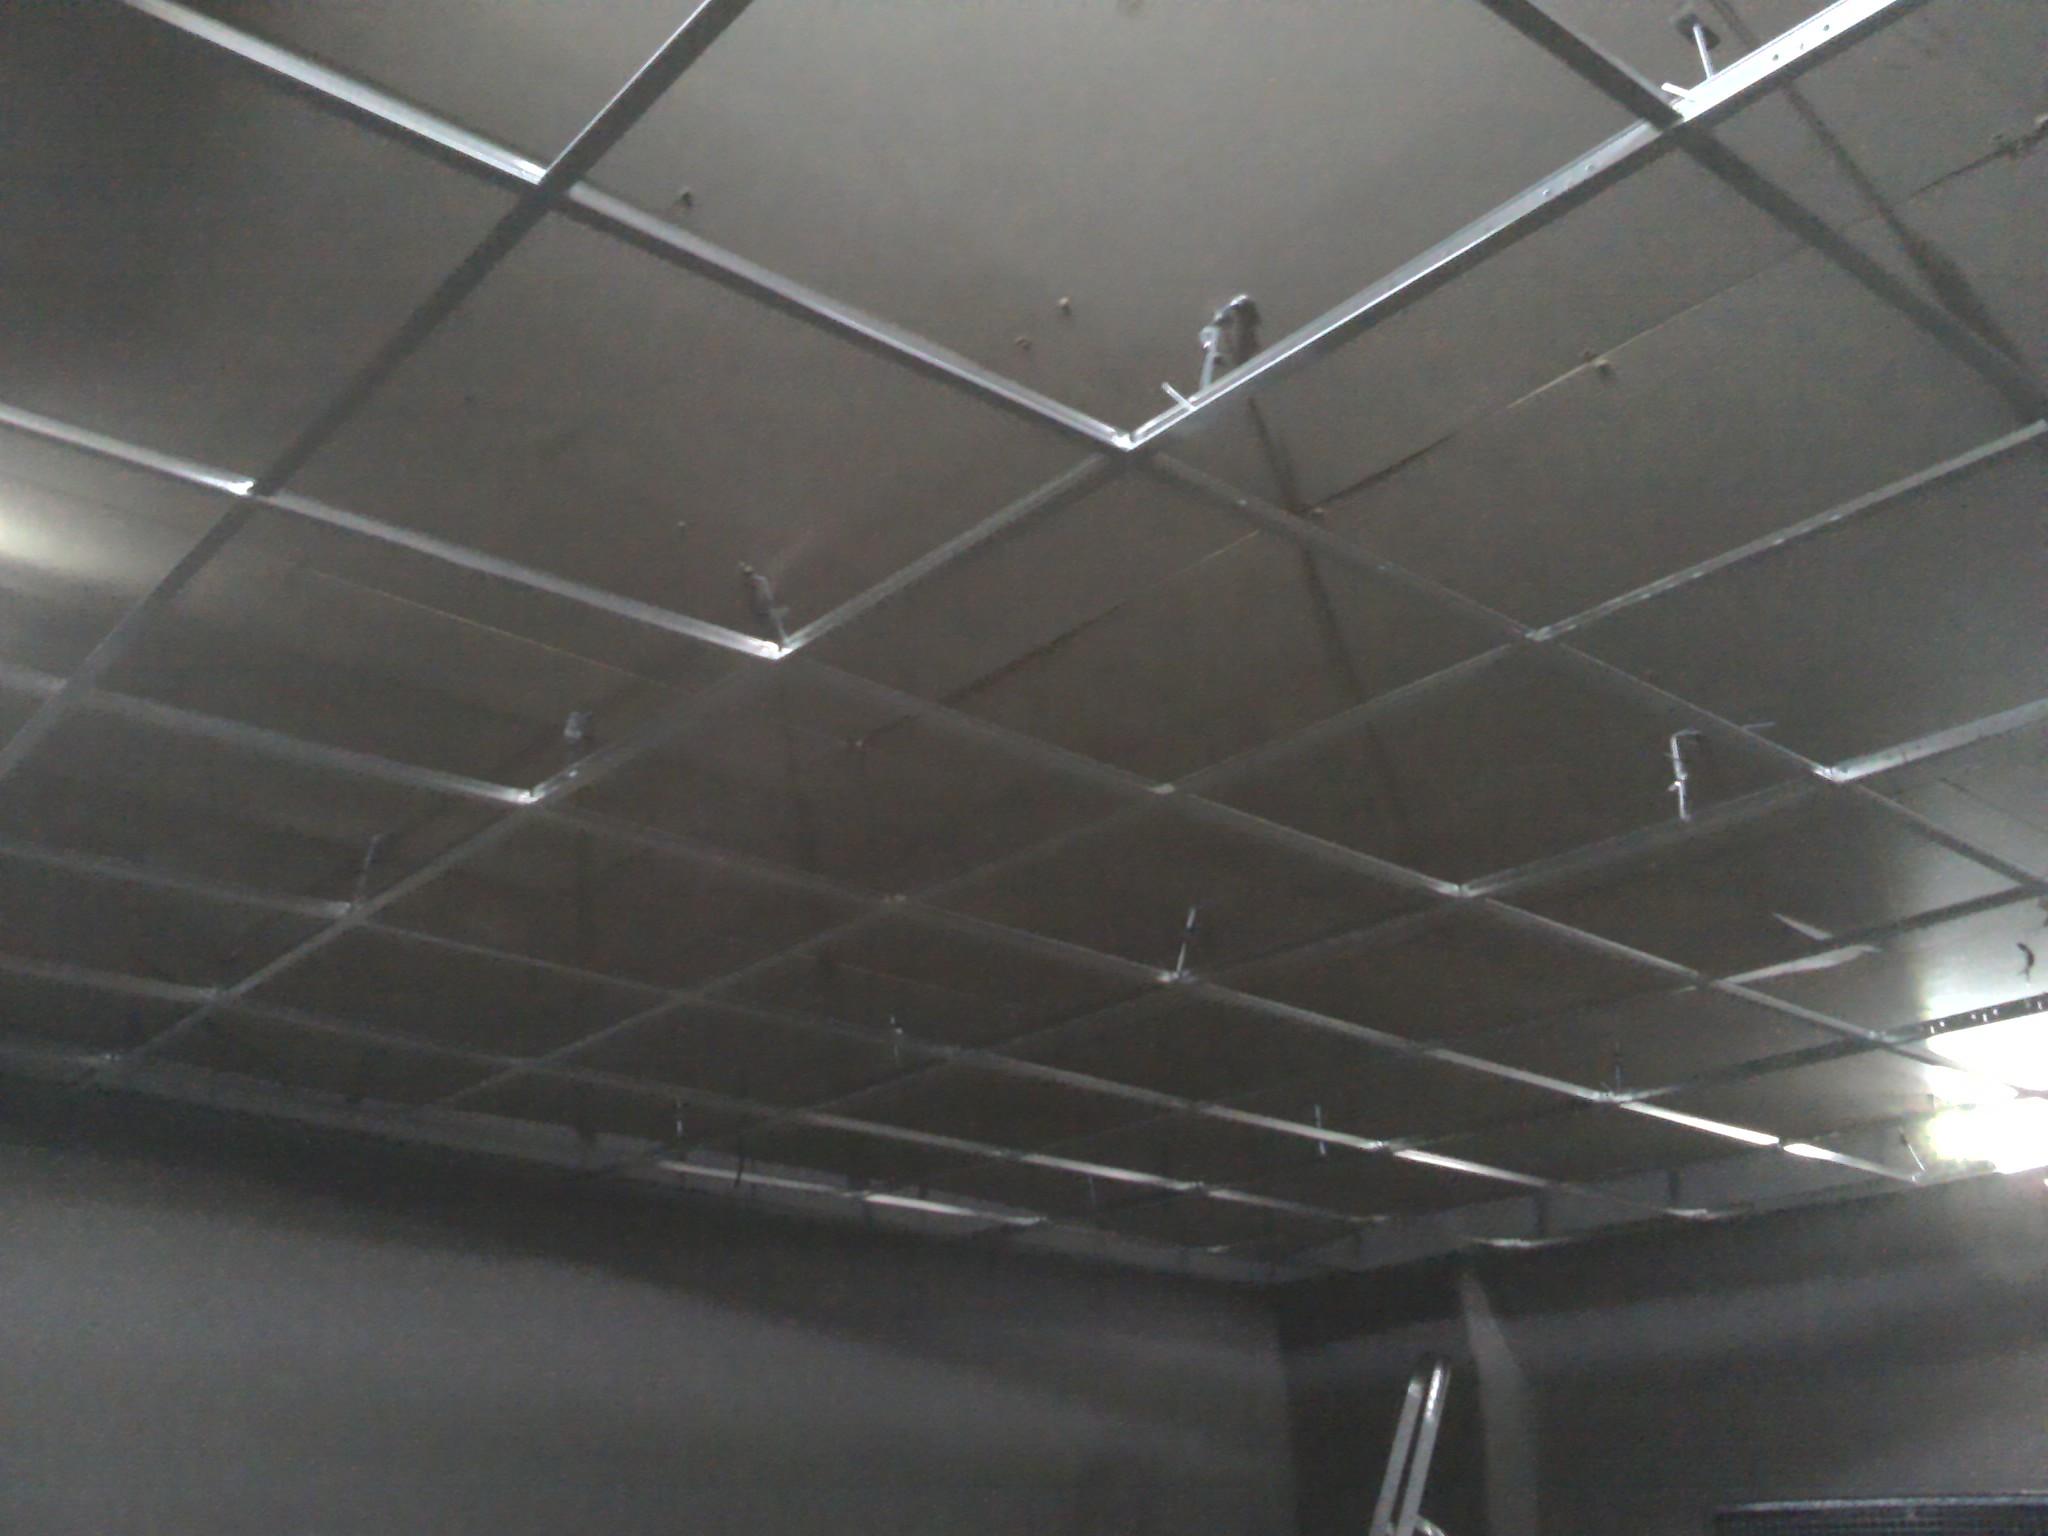 Монтаж подвесного потолка «Армстронг»: советы и рекомендации ...